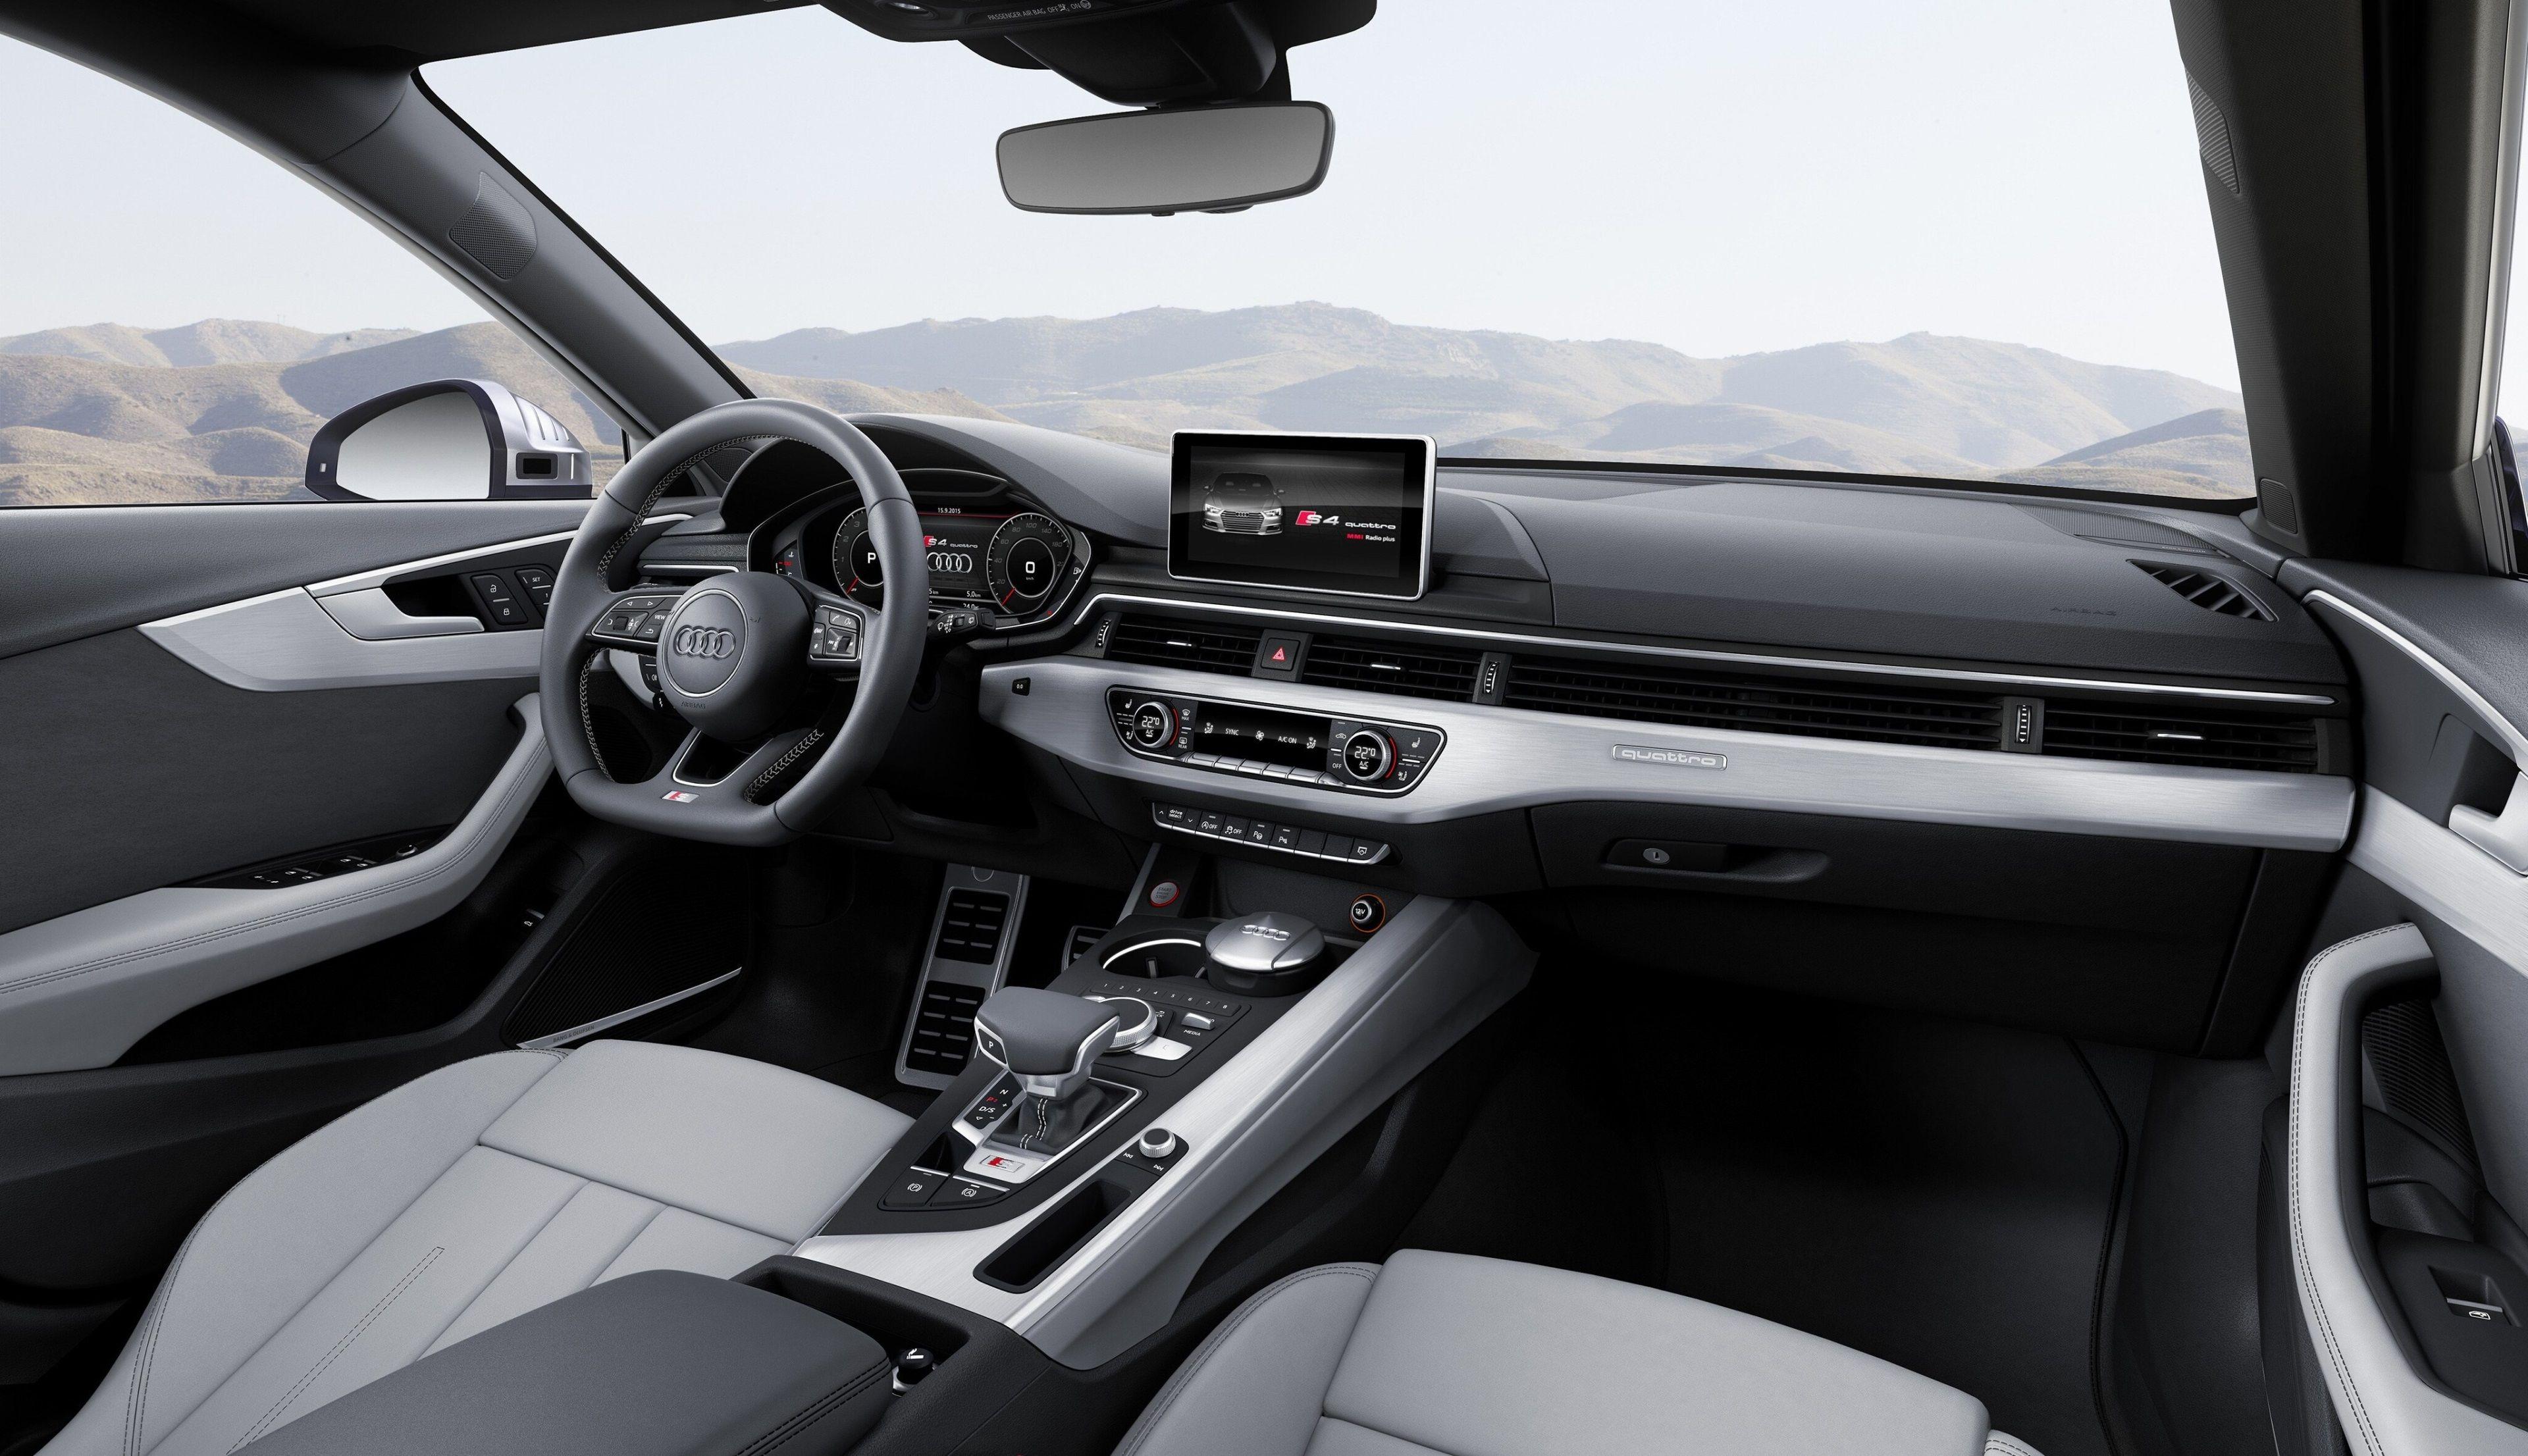 3840x2212 Audi S4 Avant B9 4k Wallpaper On Hd Audi S4 Audi Audi Sport